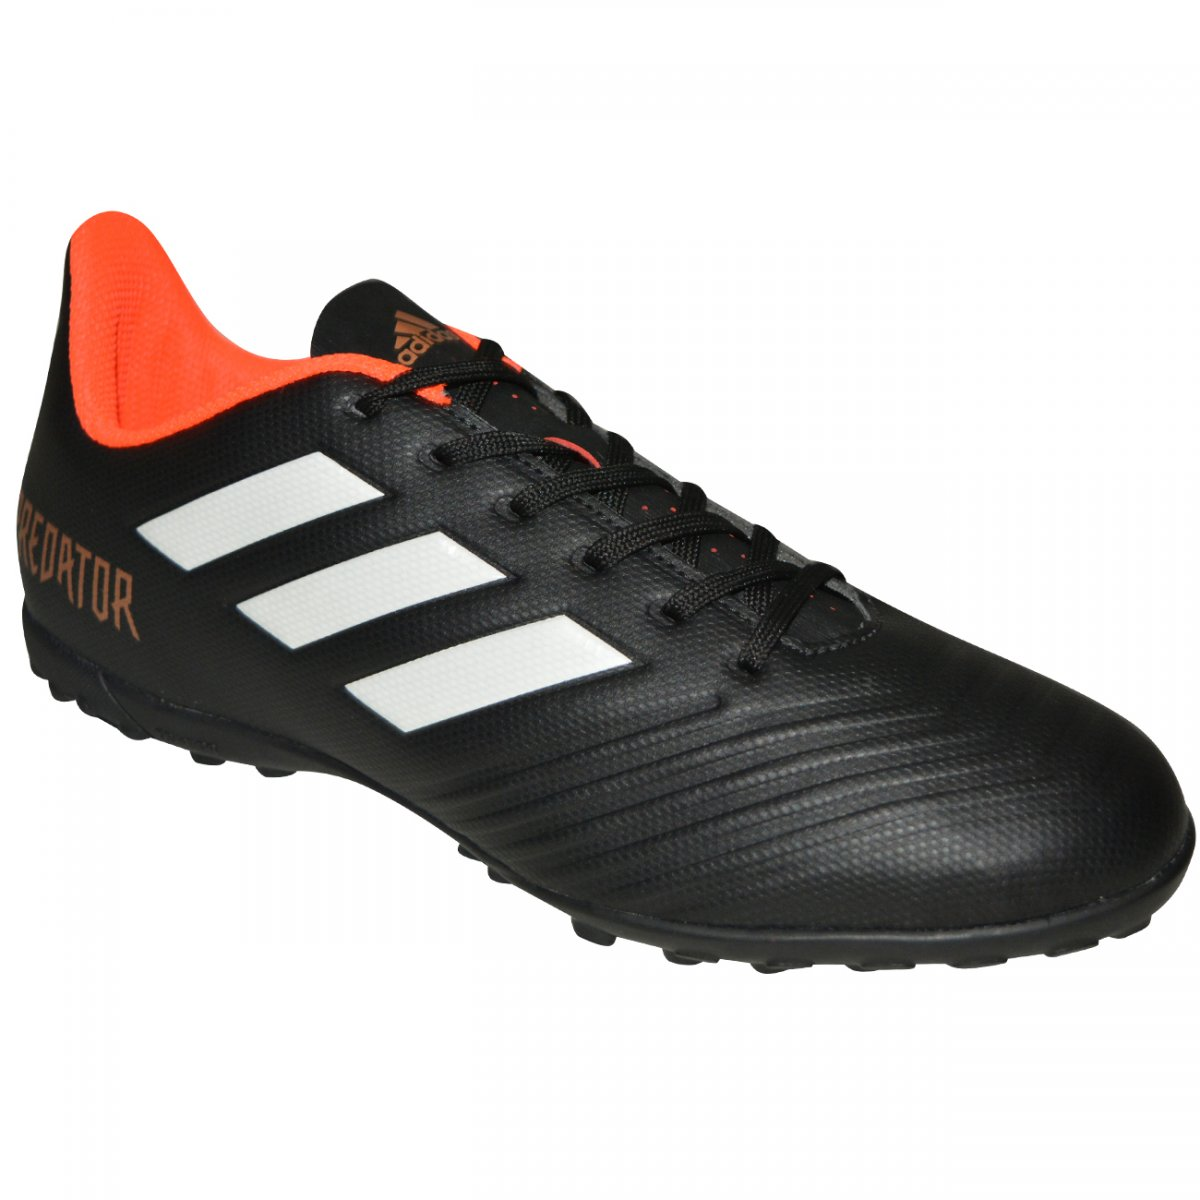 529724b264 Chuteira Society Adidas Predator Tango 18.4 CP9272 - Preto branco coral -  Chuteira Nike